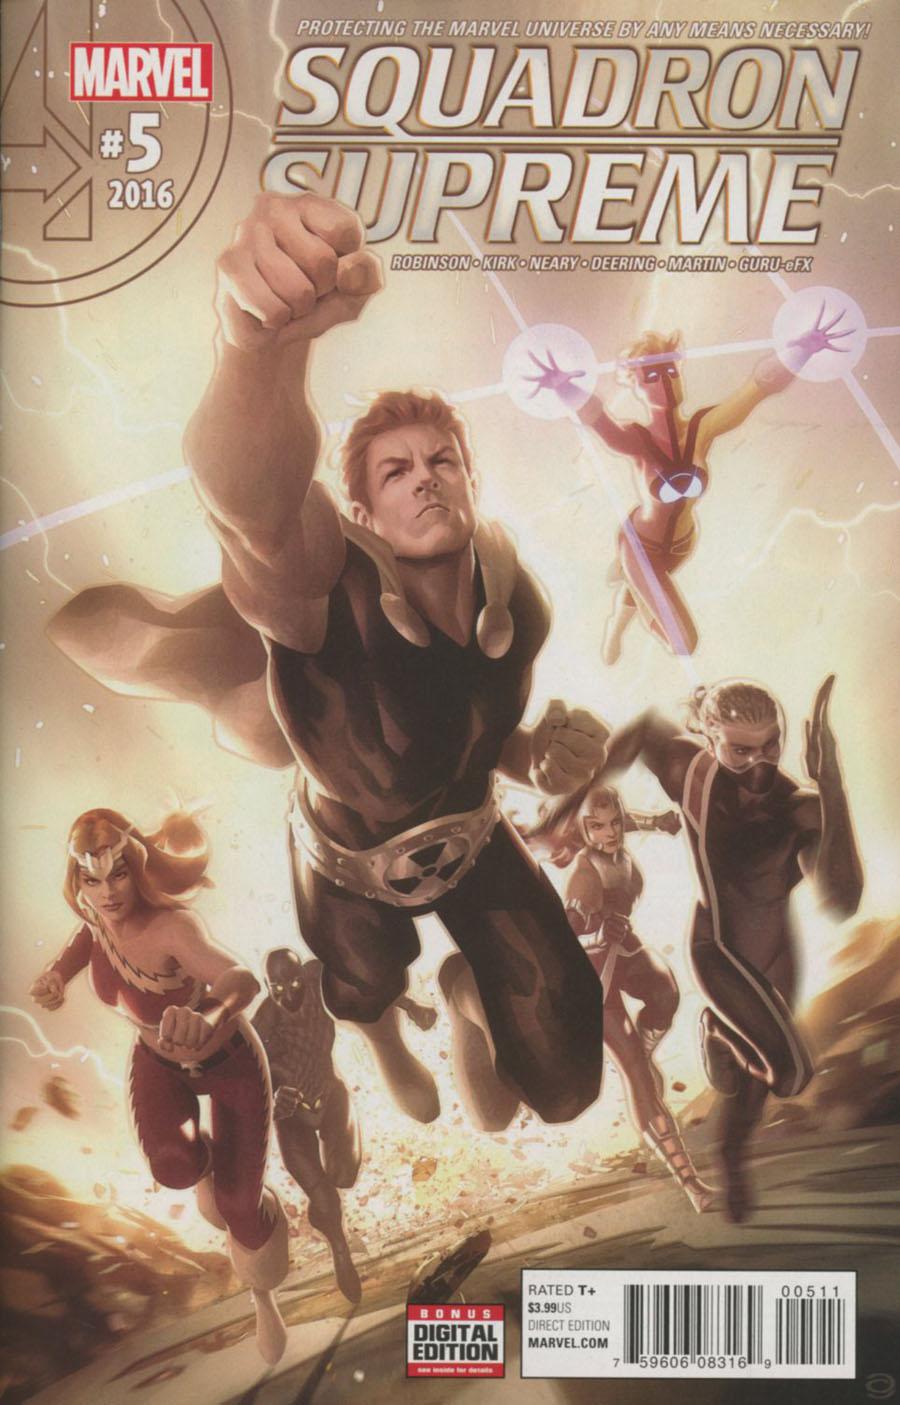 Squadron Supreme Vol 4 #5 Cover A Regular Alex Garner Cover